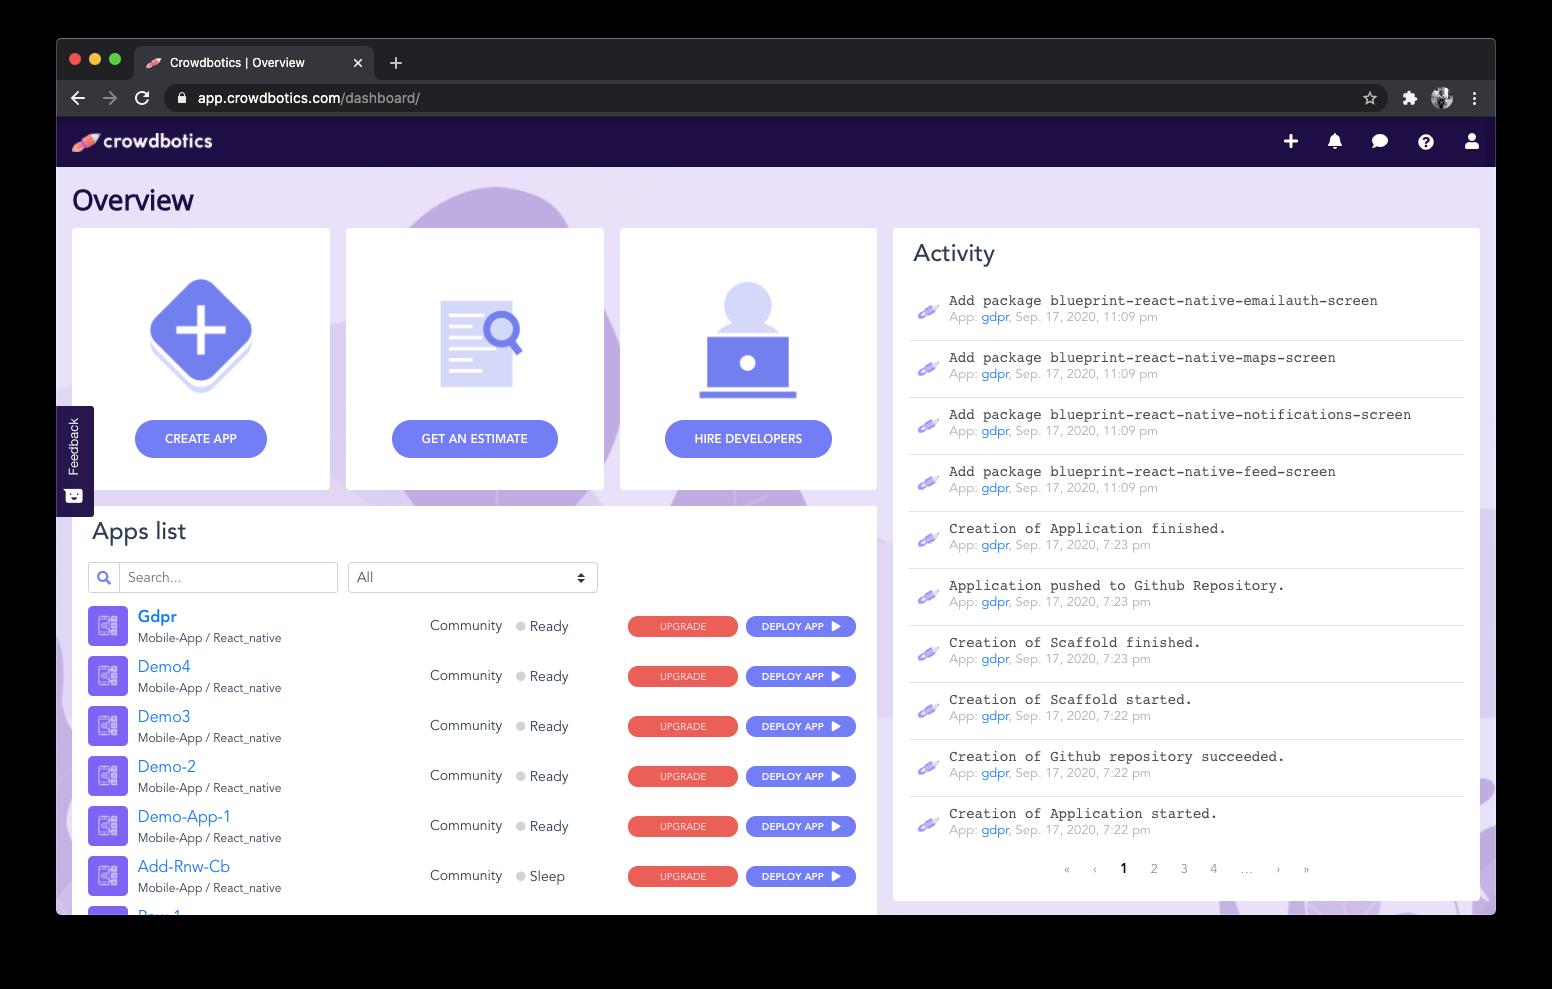 A screenshot of your user dashboard in the Crowdbotics platform.